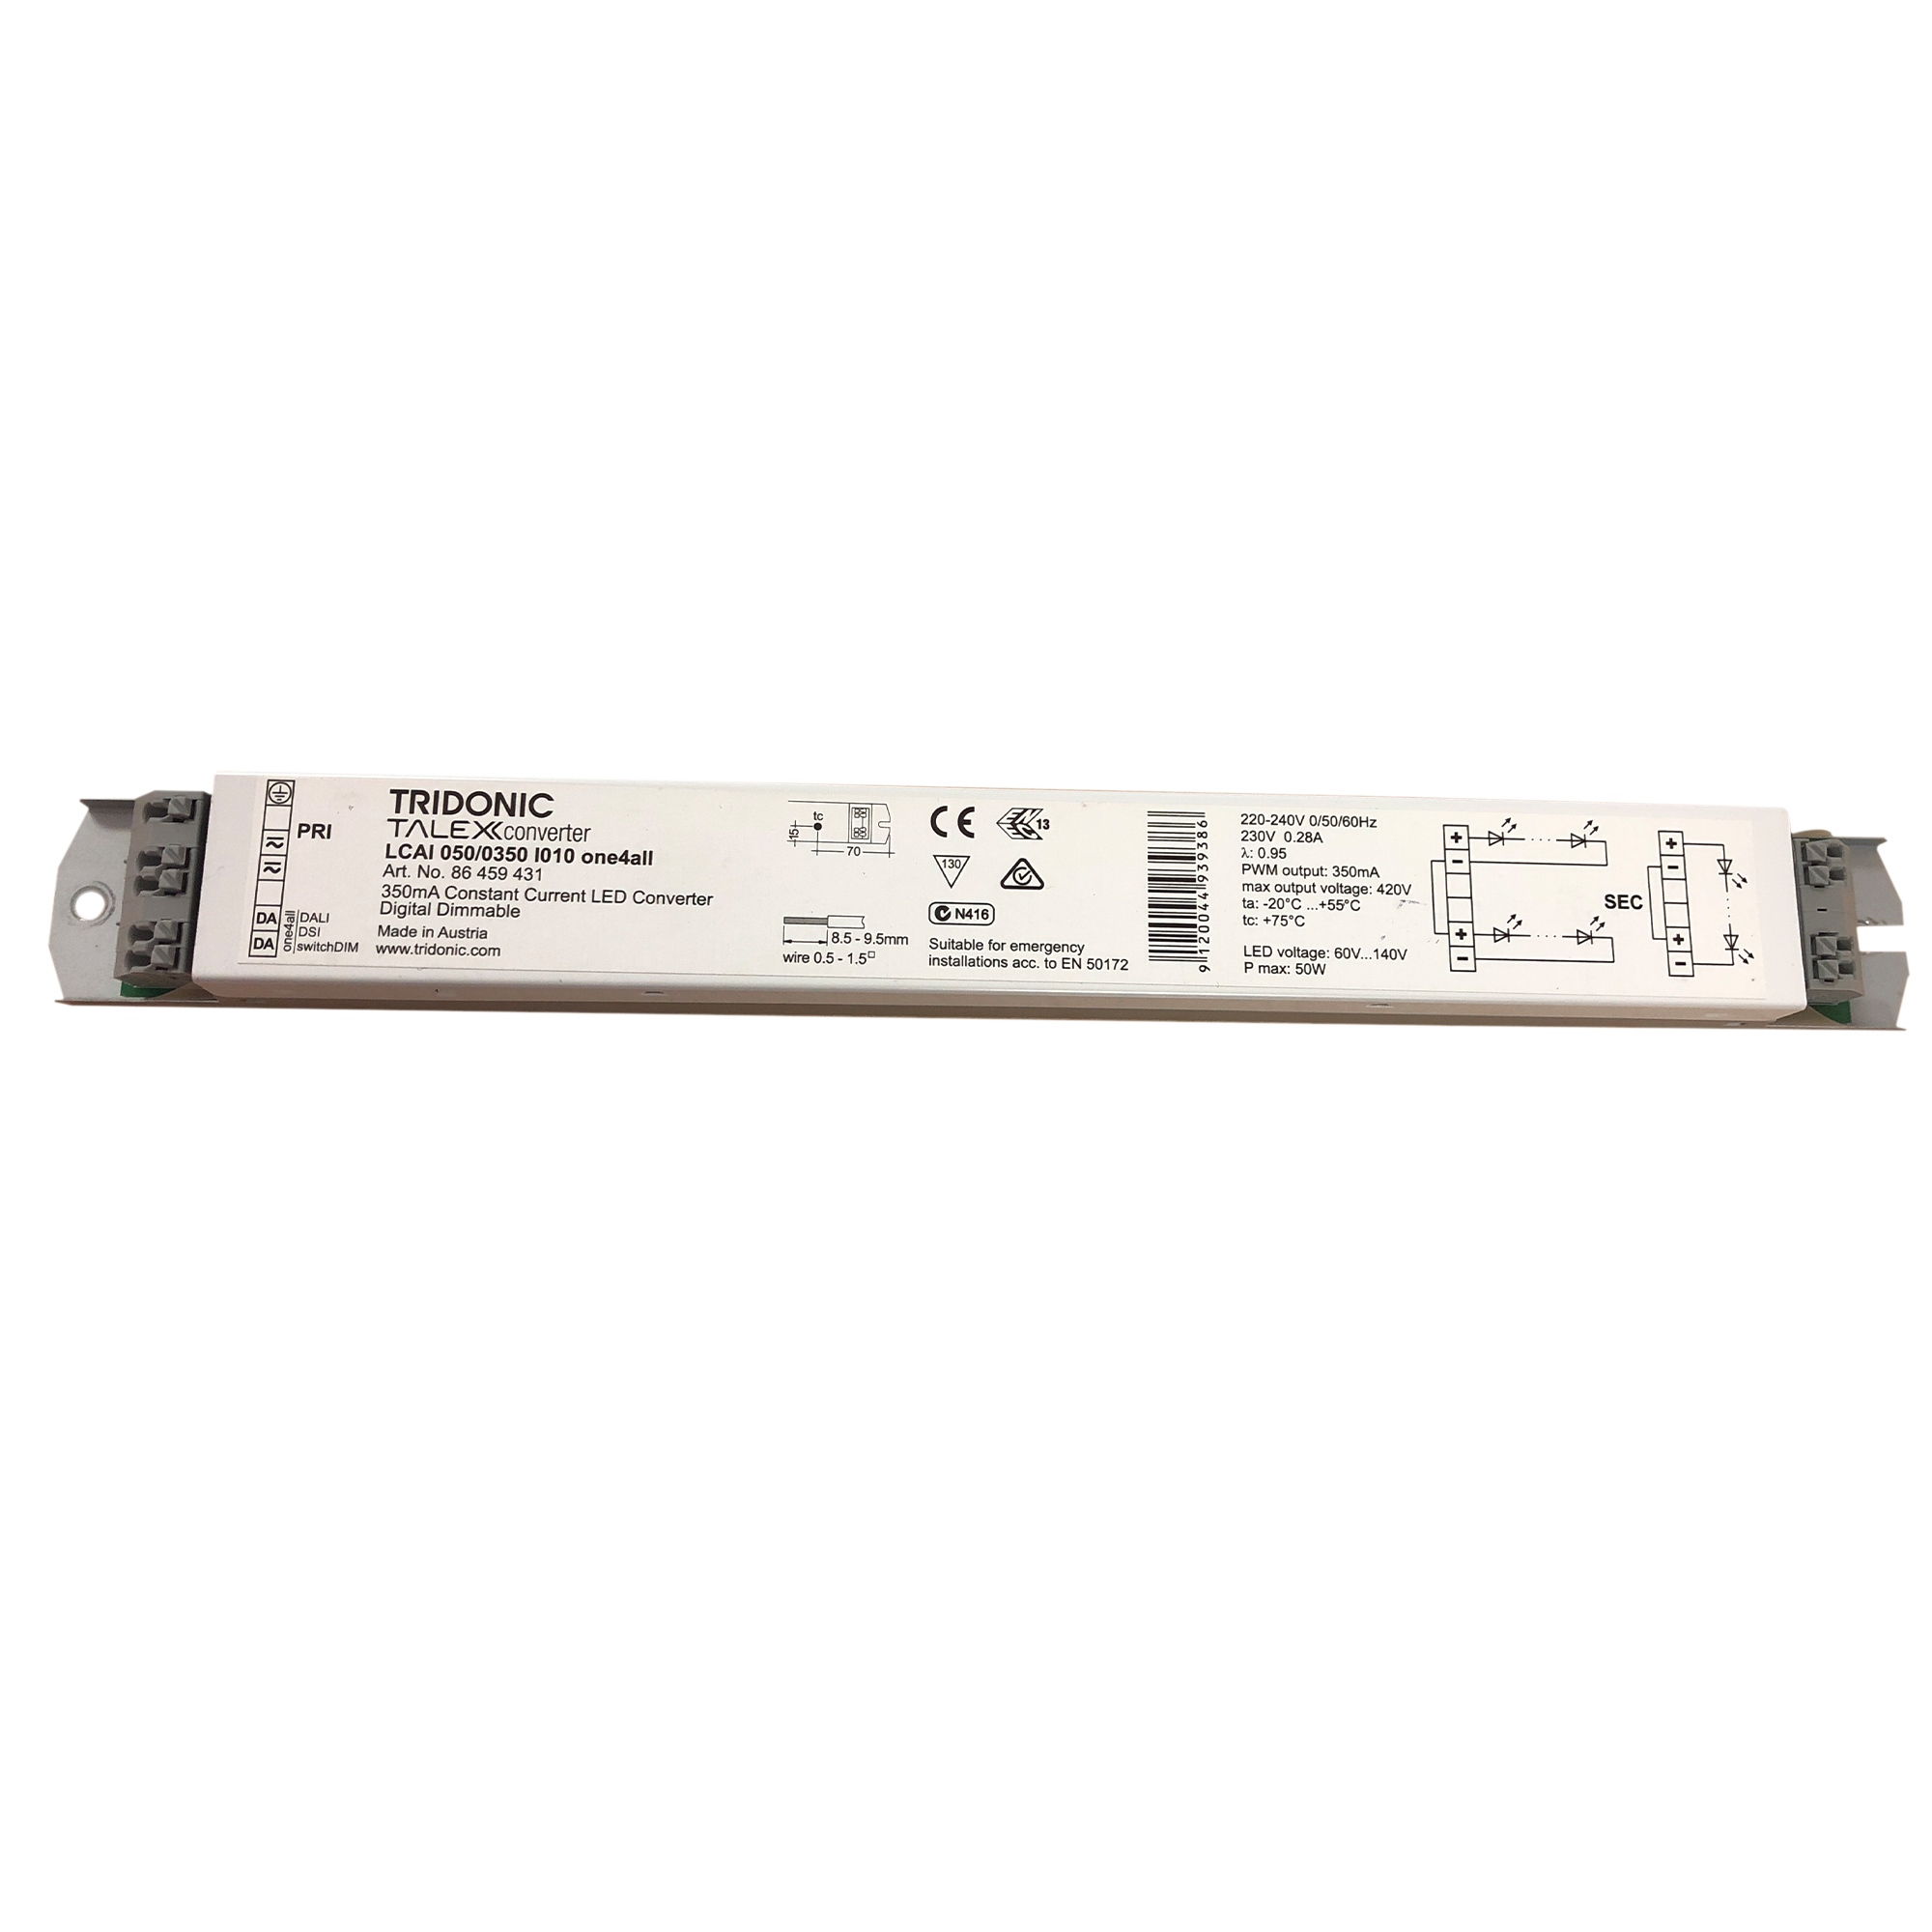 Tridonic TALEXX Converter LCAI 050/0350 I010 one4all 350mA Konstantstrom LED Trafo